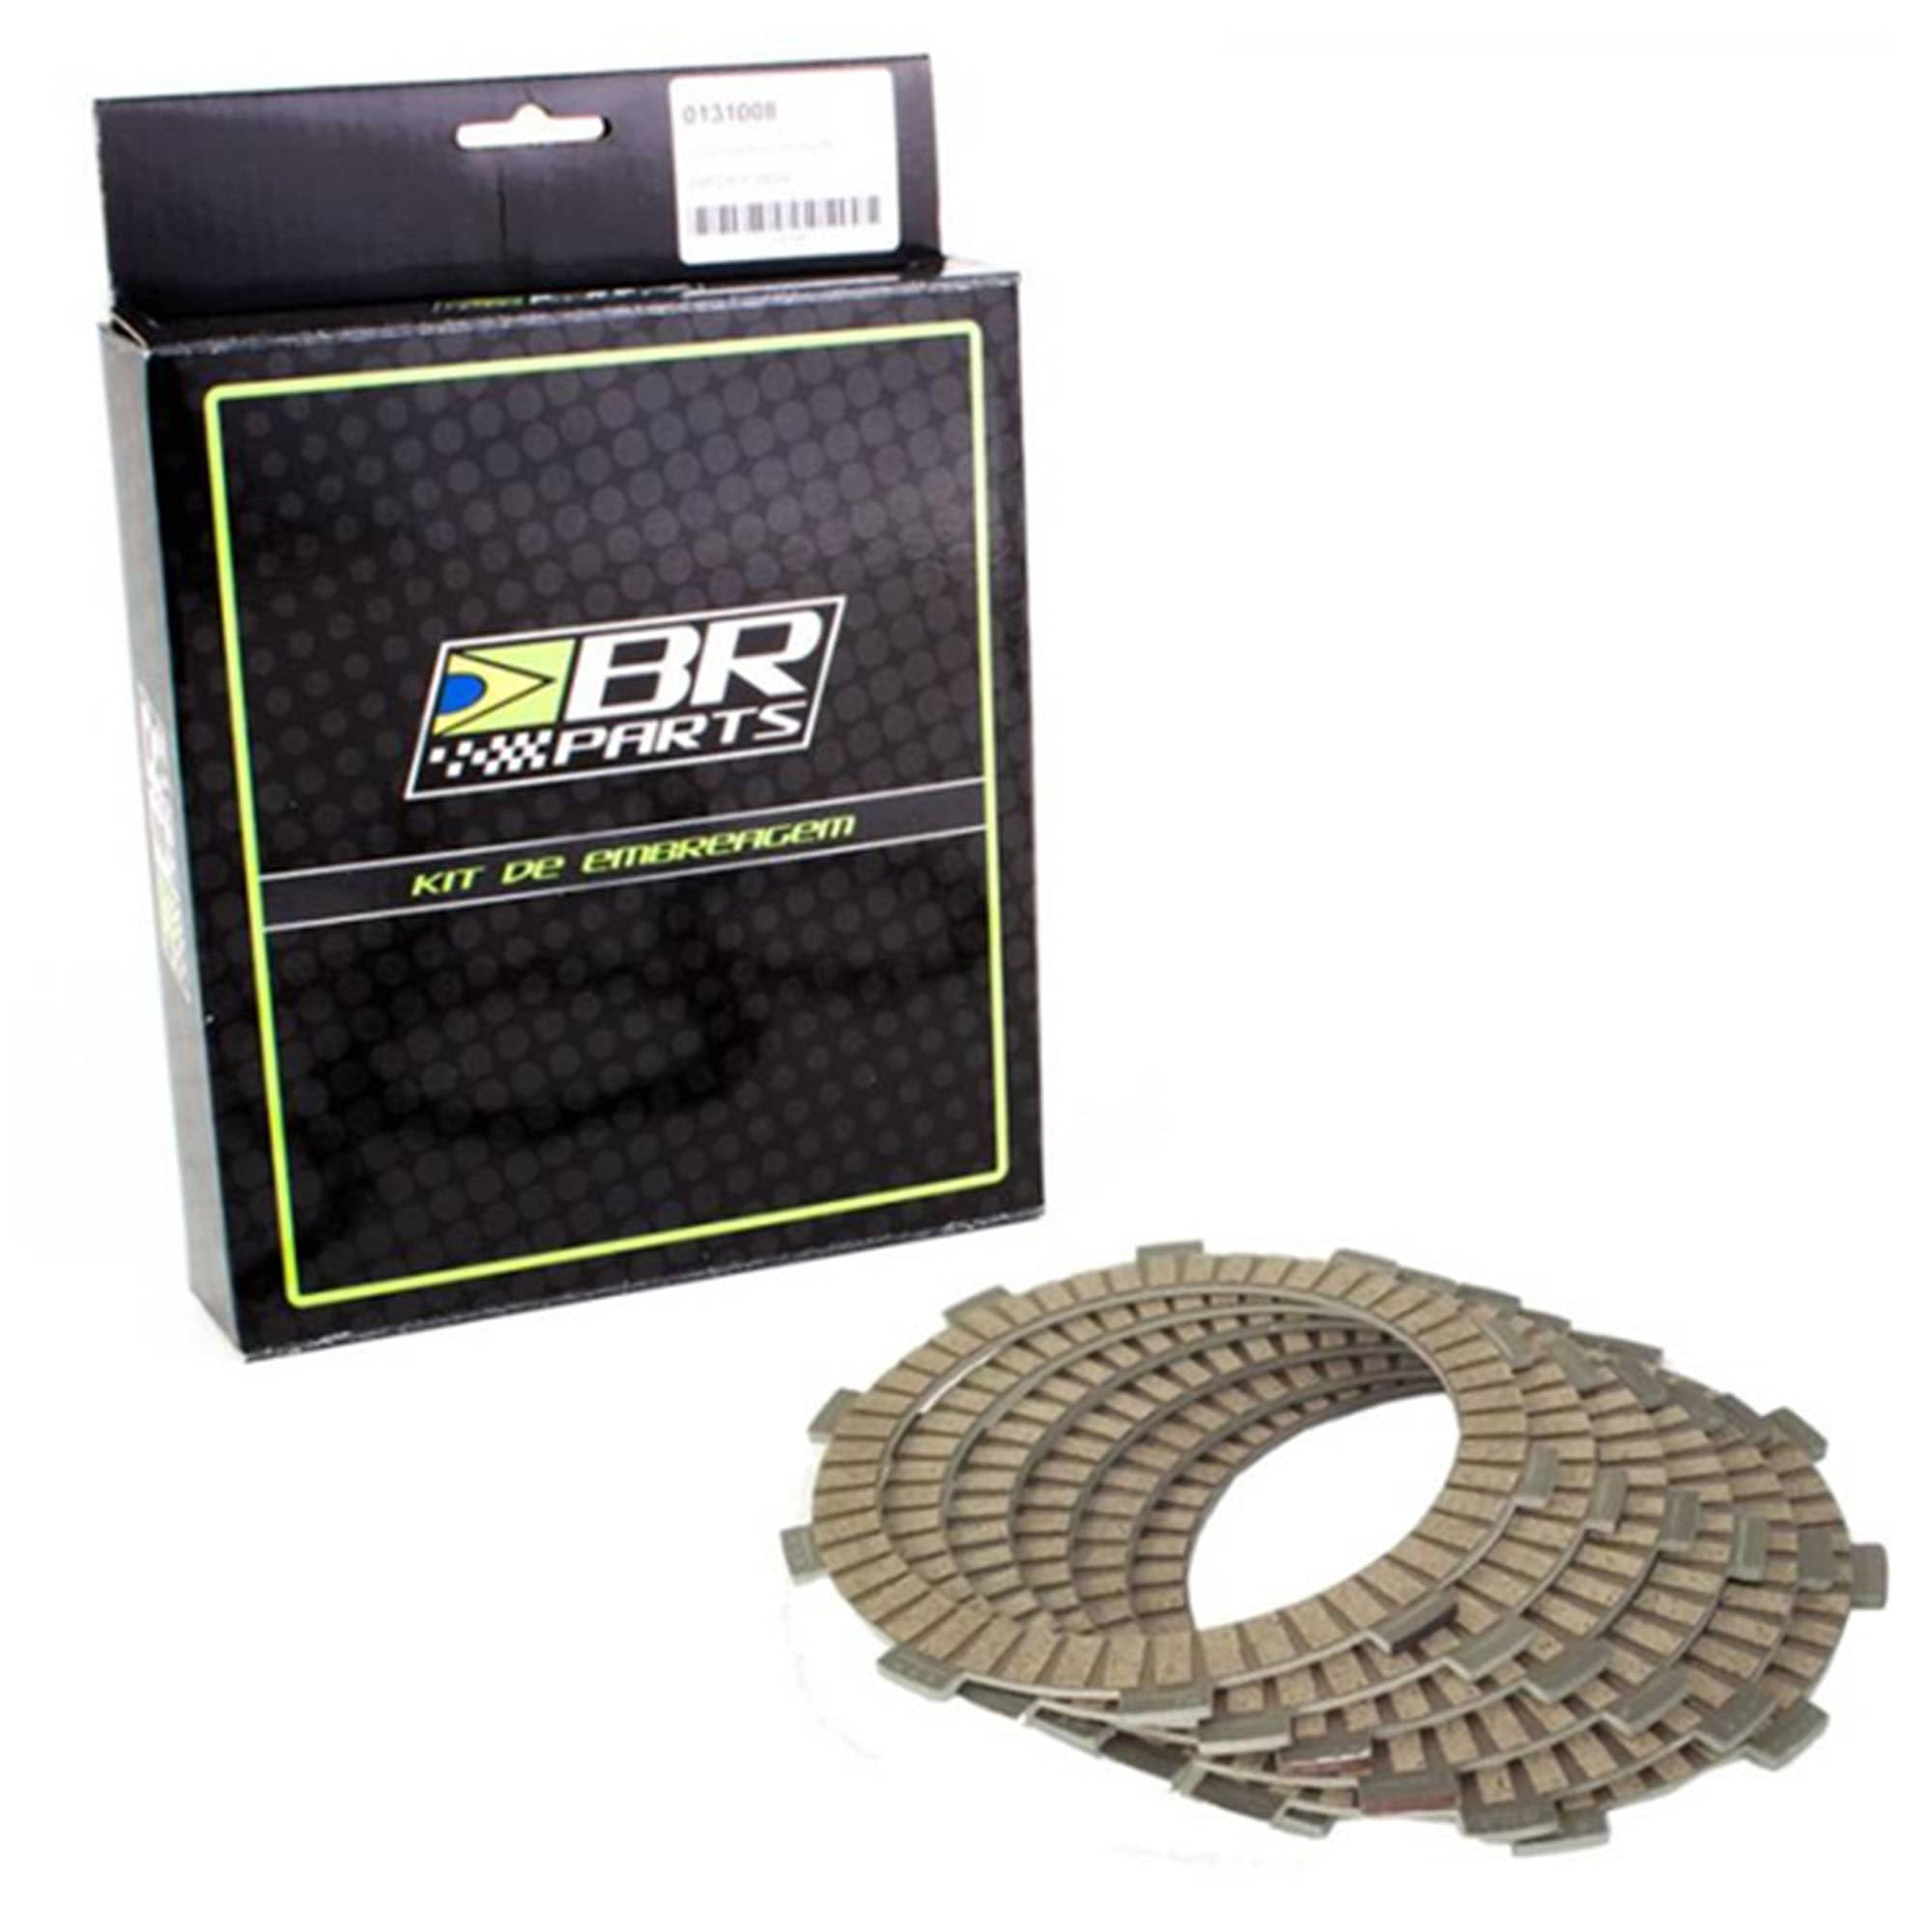 Kit de Disco de Embreagem + Separadores BR Parts KXF 250 06/20 e RMZ 250 04/12  - HP Race Off Road